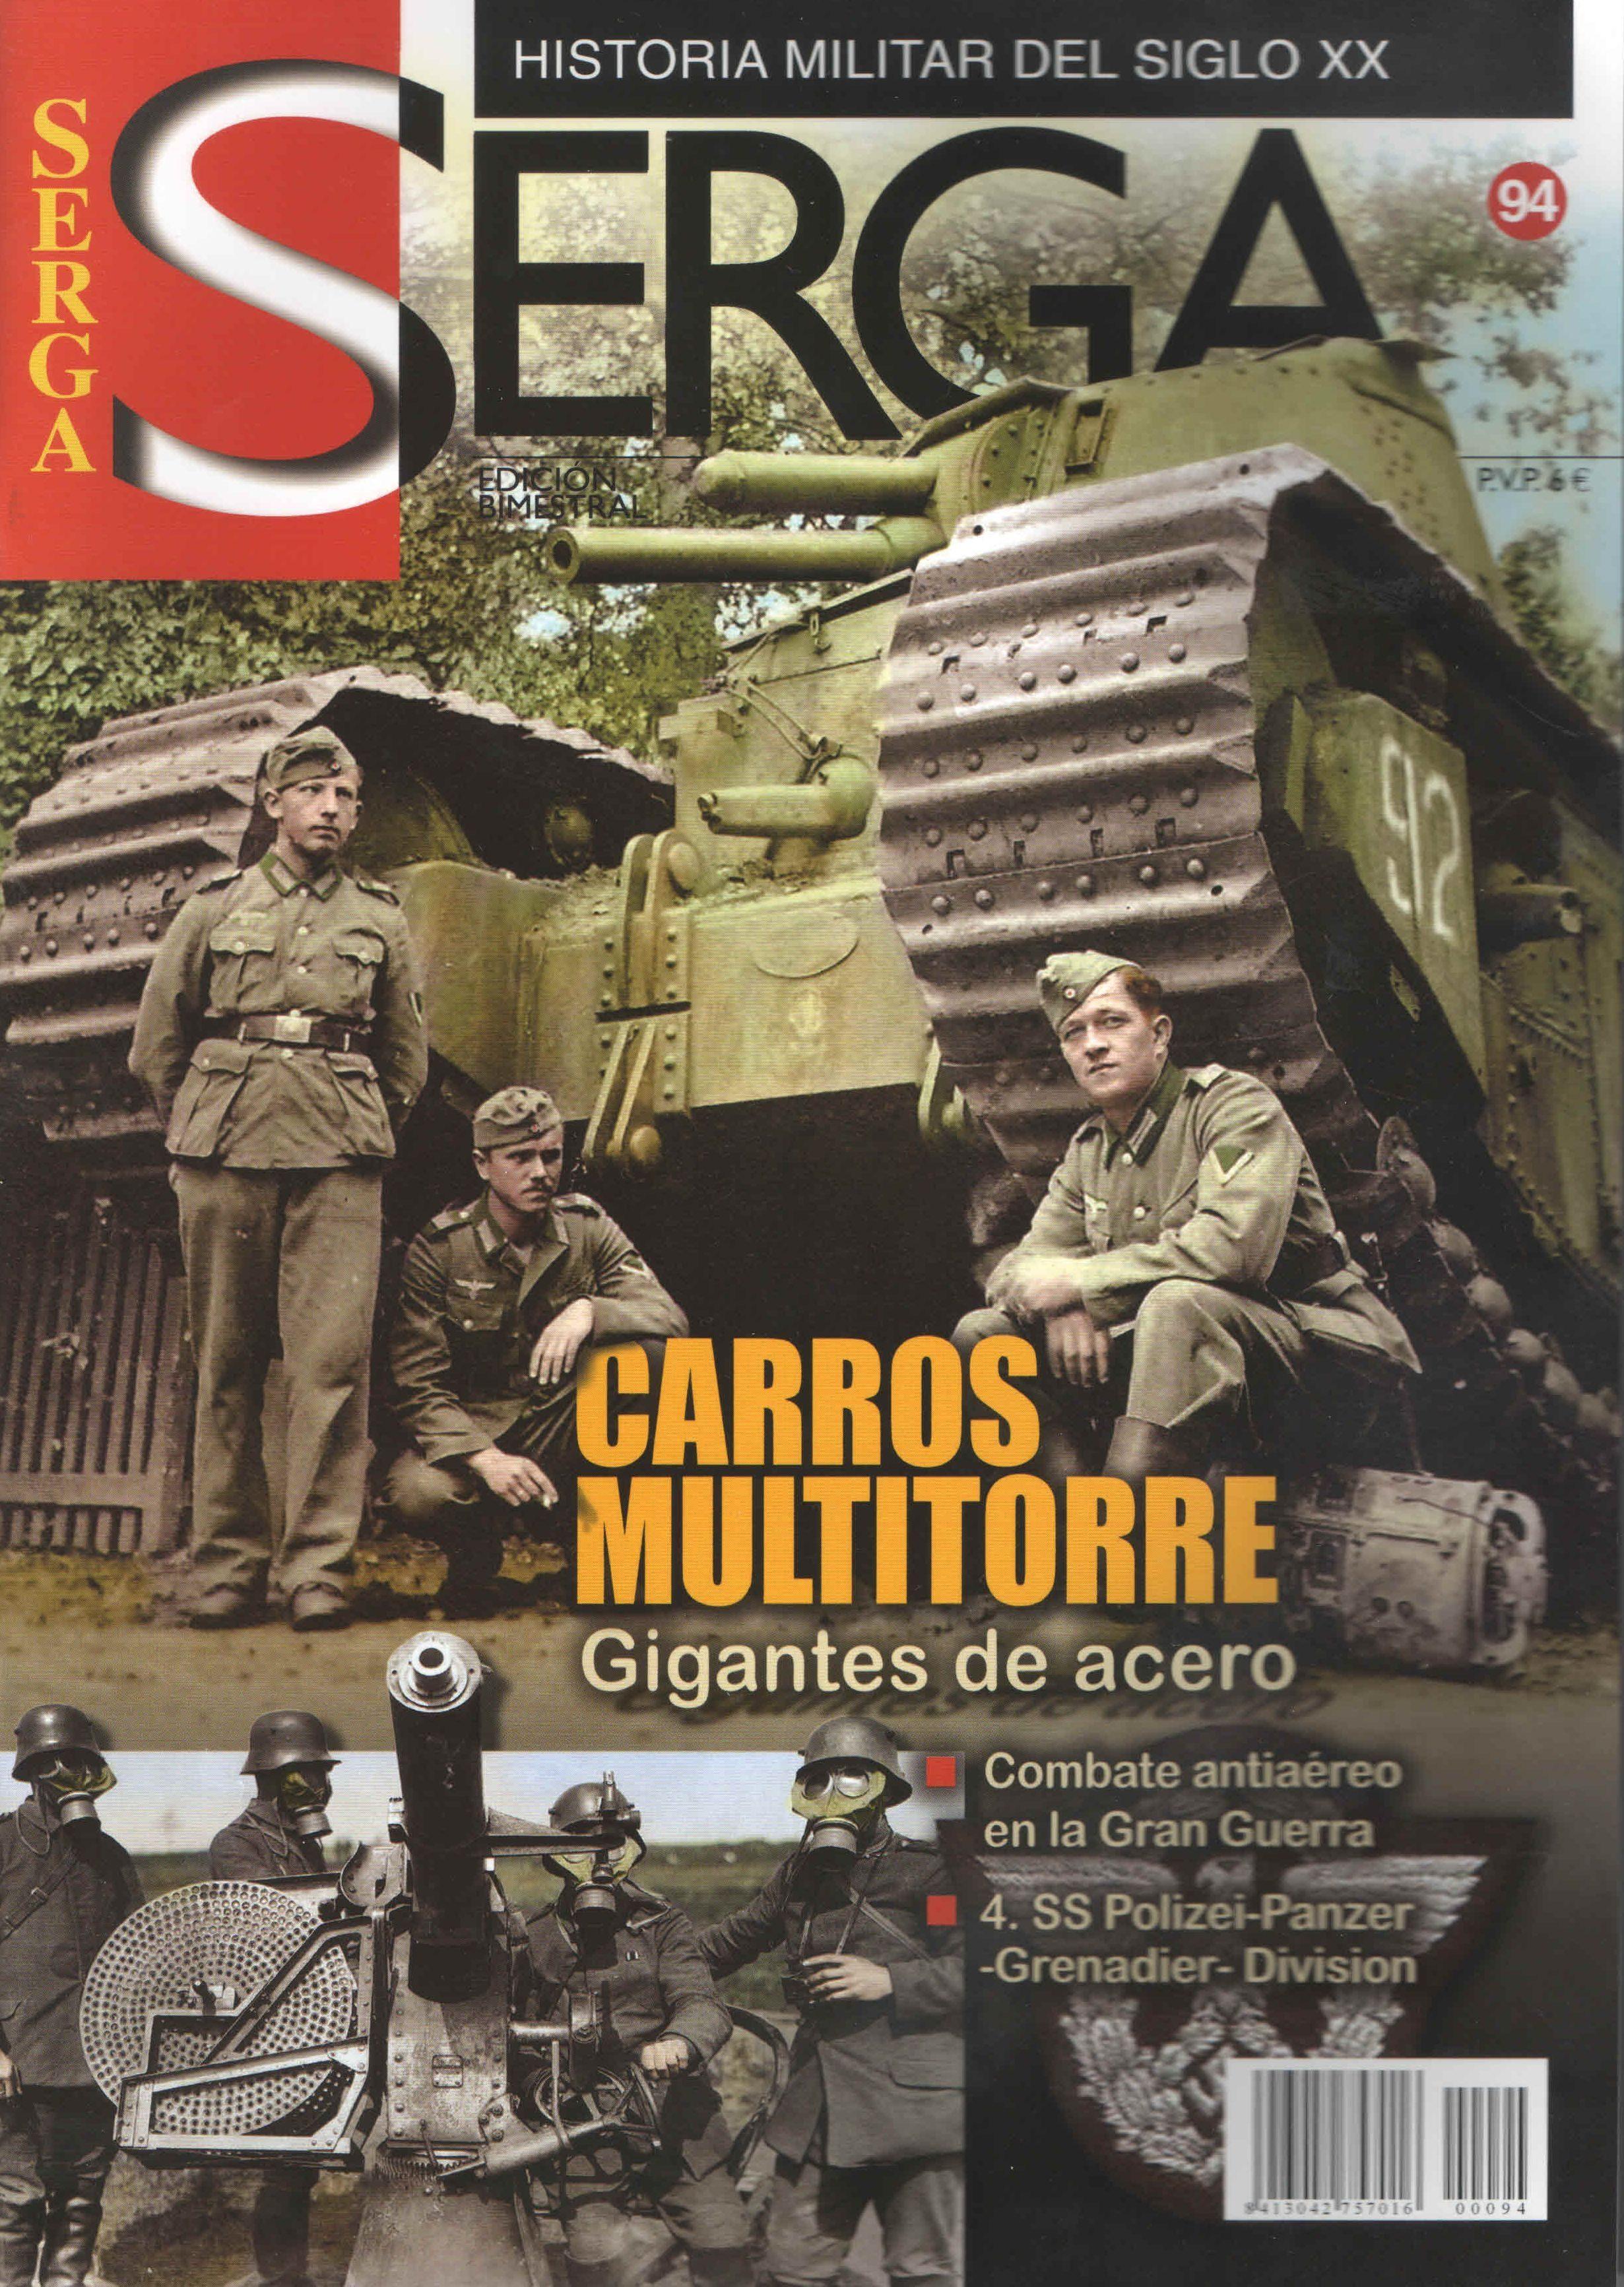 Serga Nº 36 (julio-agosto 2005): Historia Militar Del Siglo Xx por Vv.aa. epub